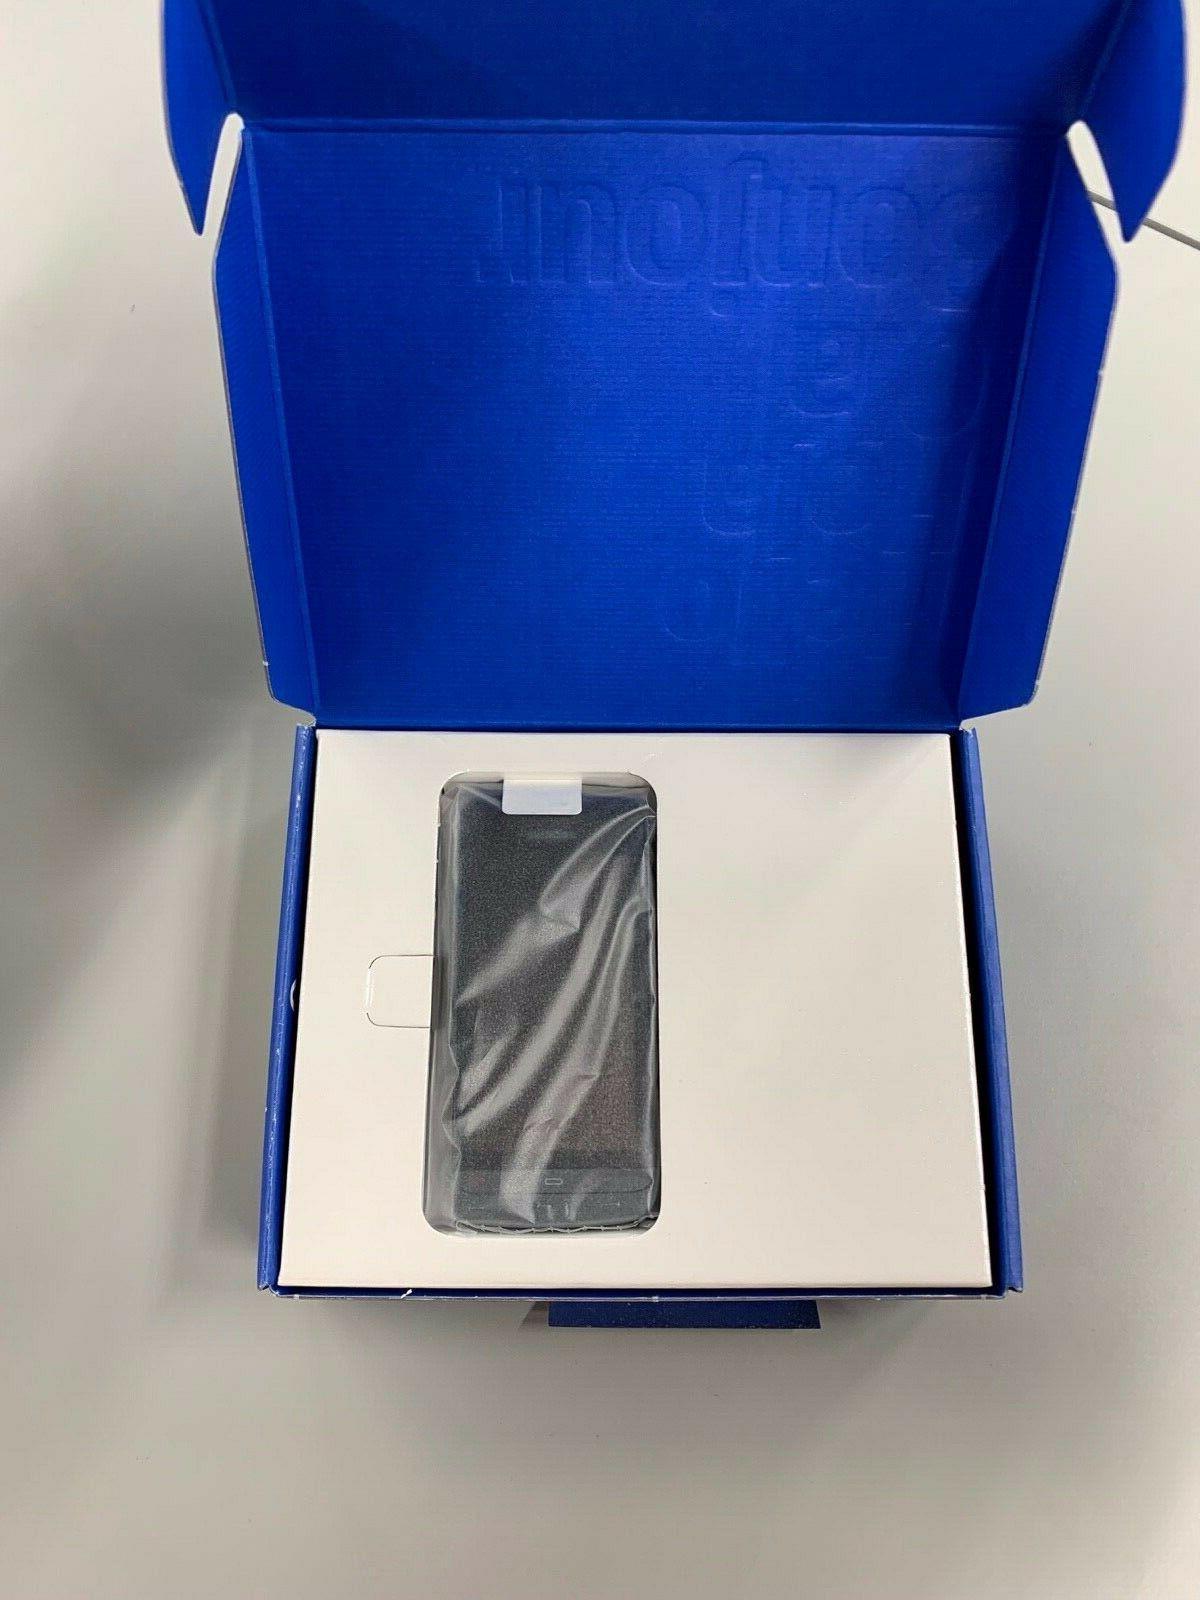 Brand New VideoTron Smartphone